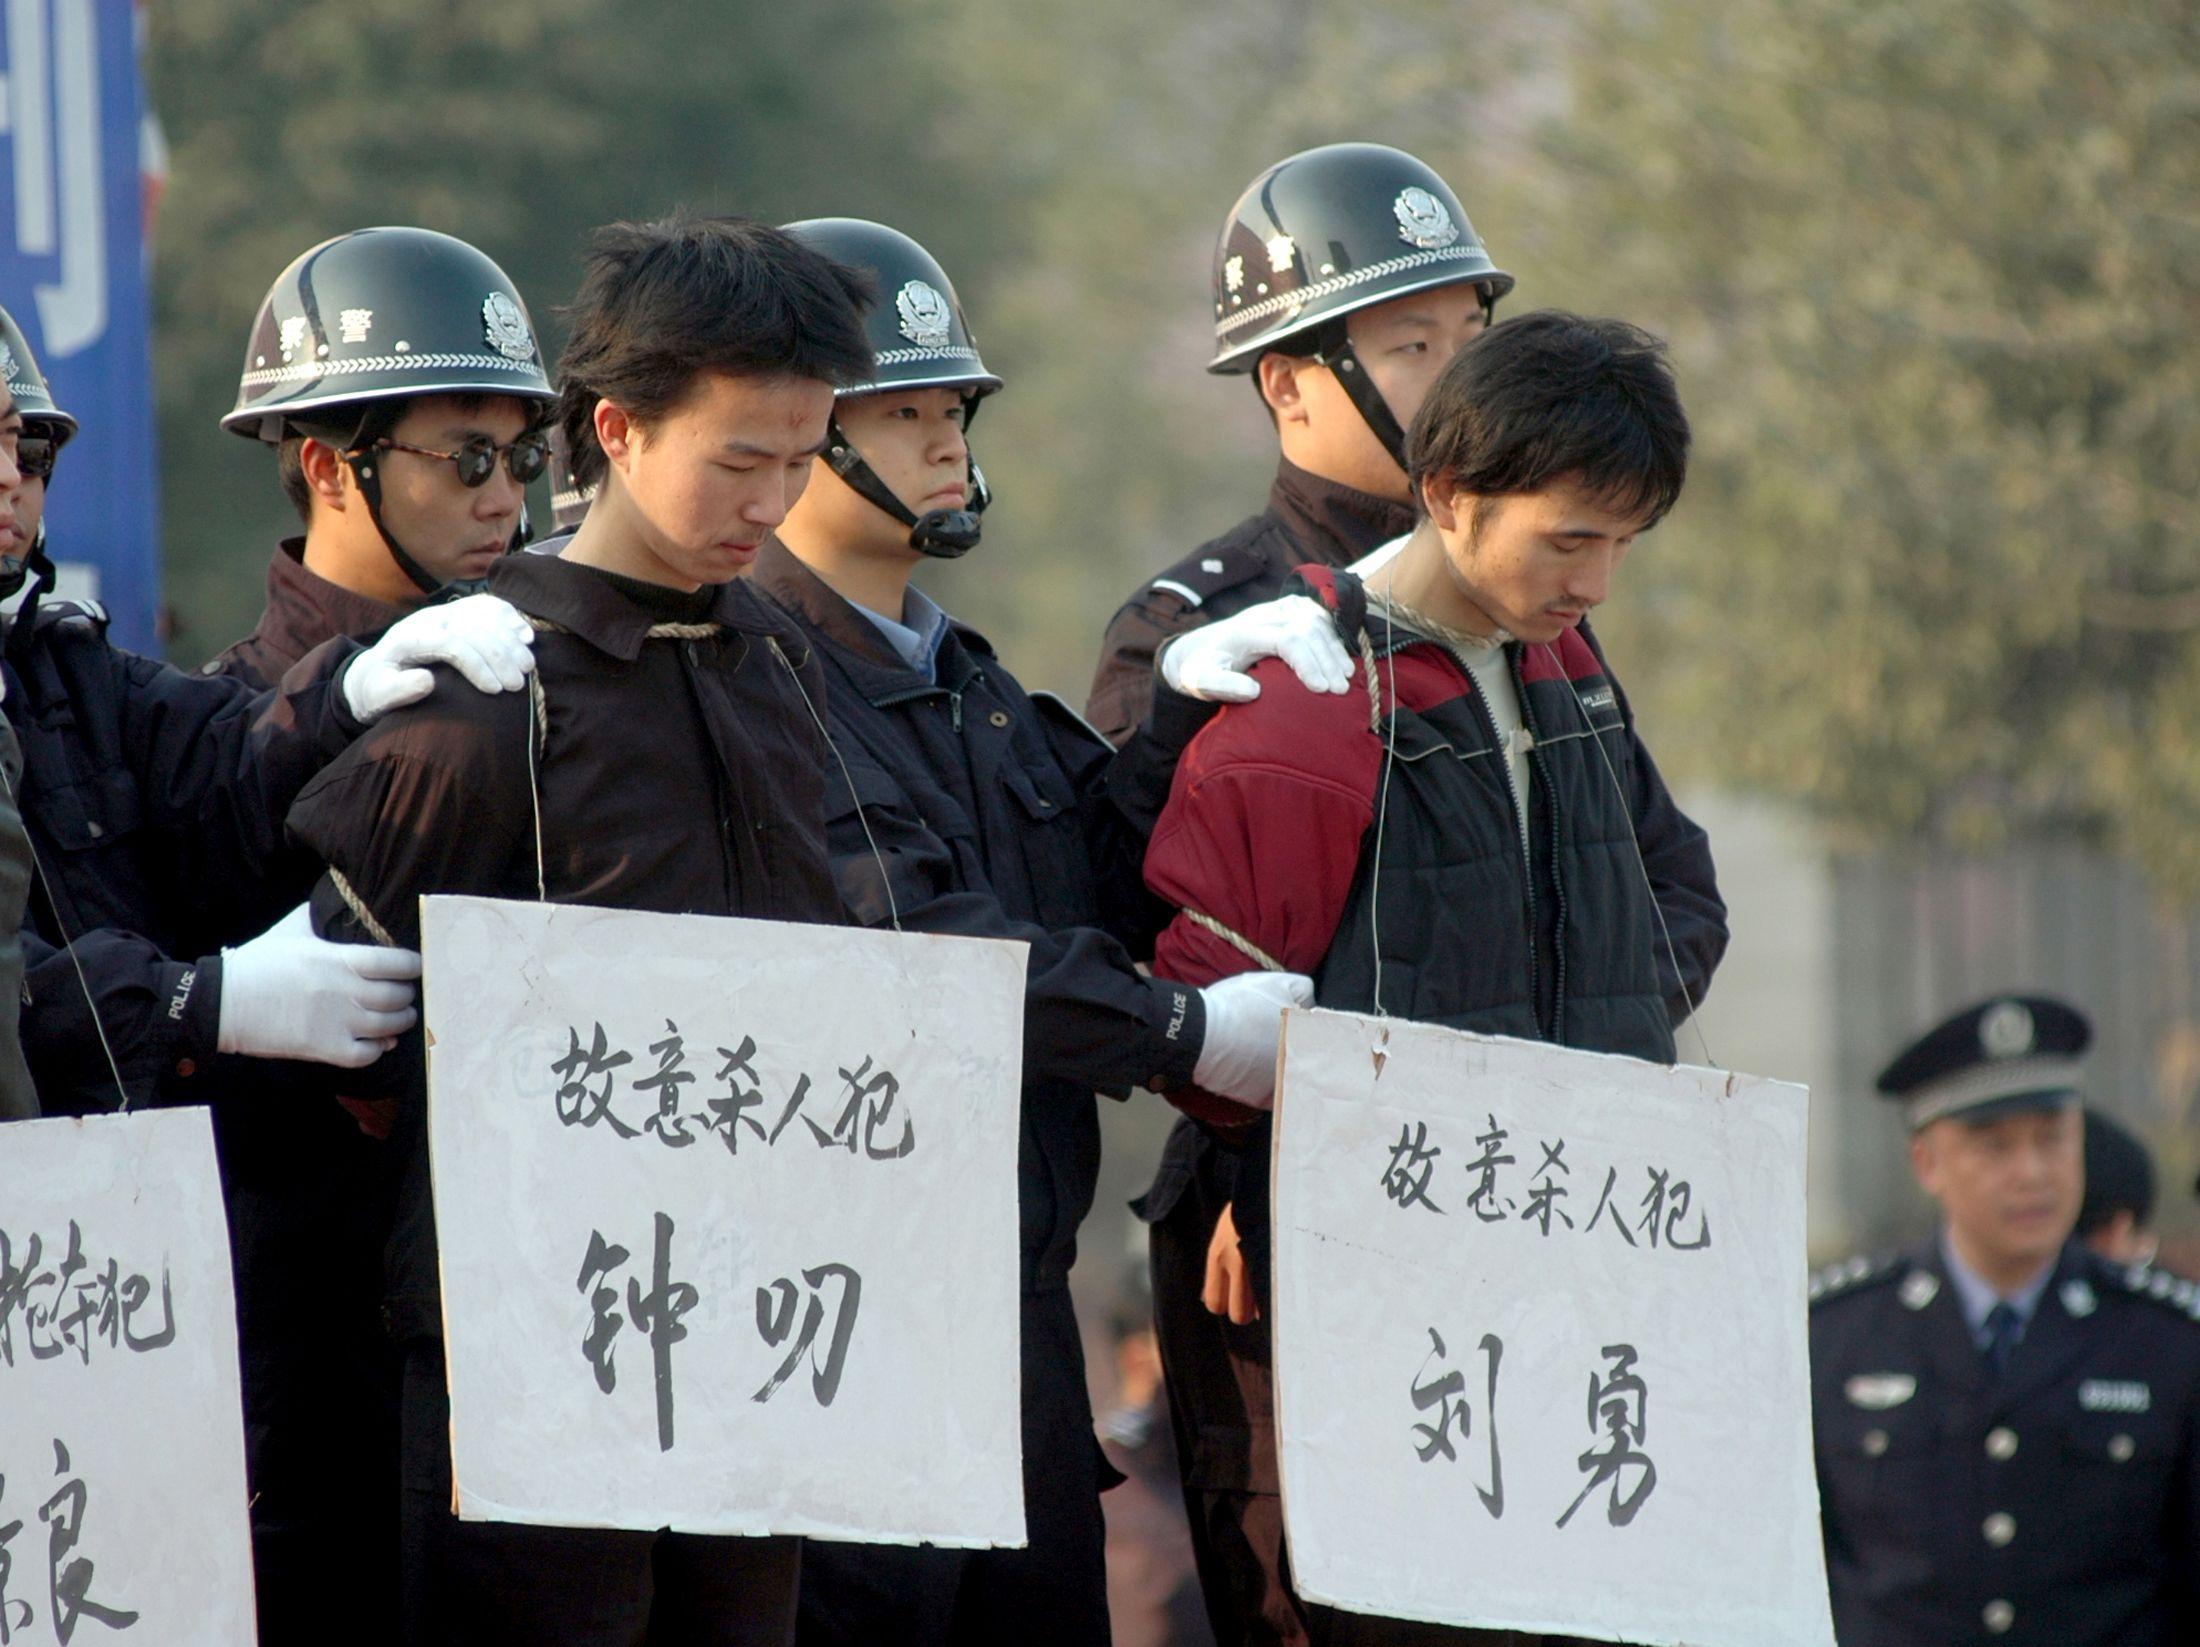 https://i1.wp.com/s.newsweek.com/sites/www.newsweek.com/files/styles/lg/public/2014/10/21/china-death-penalty.jpg